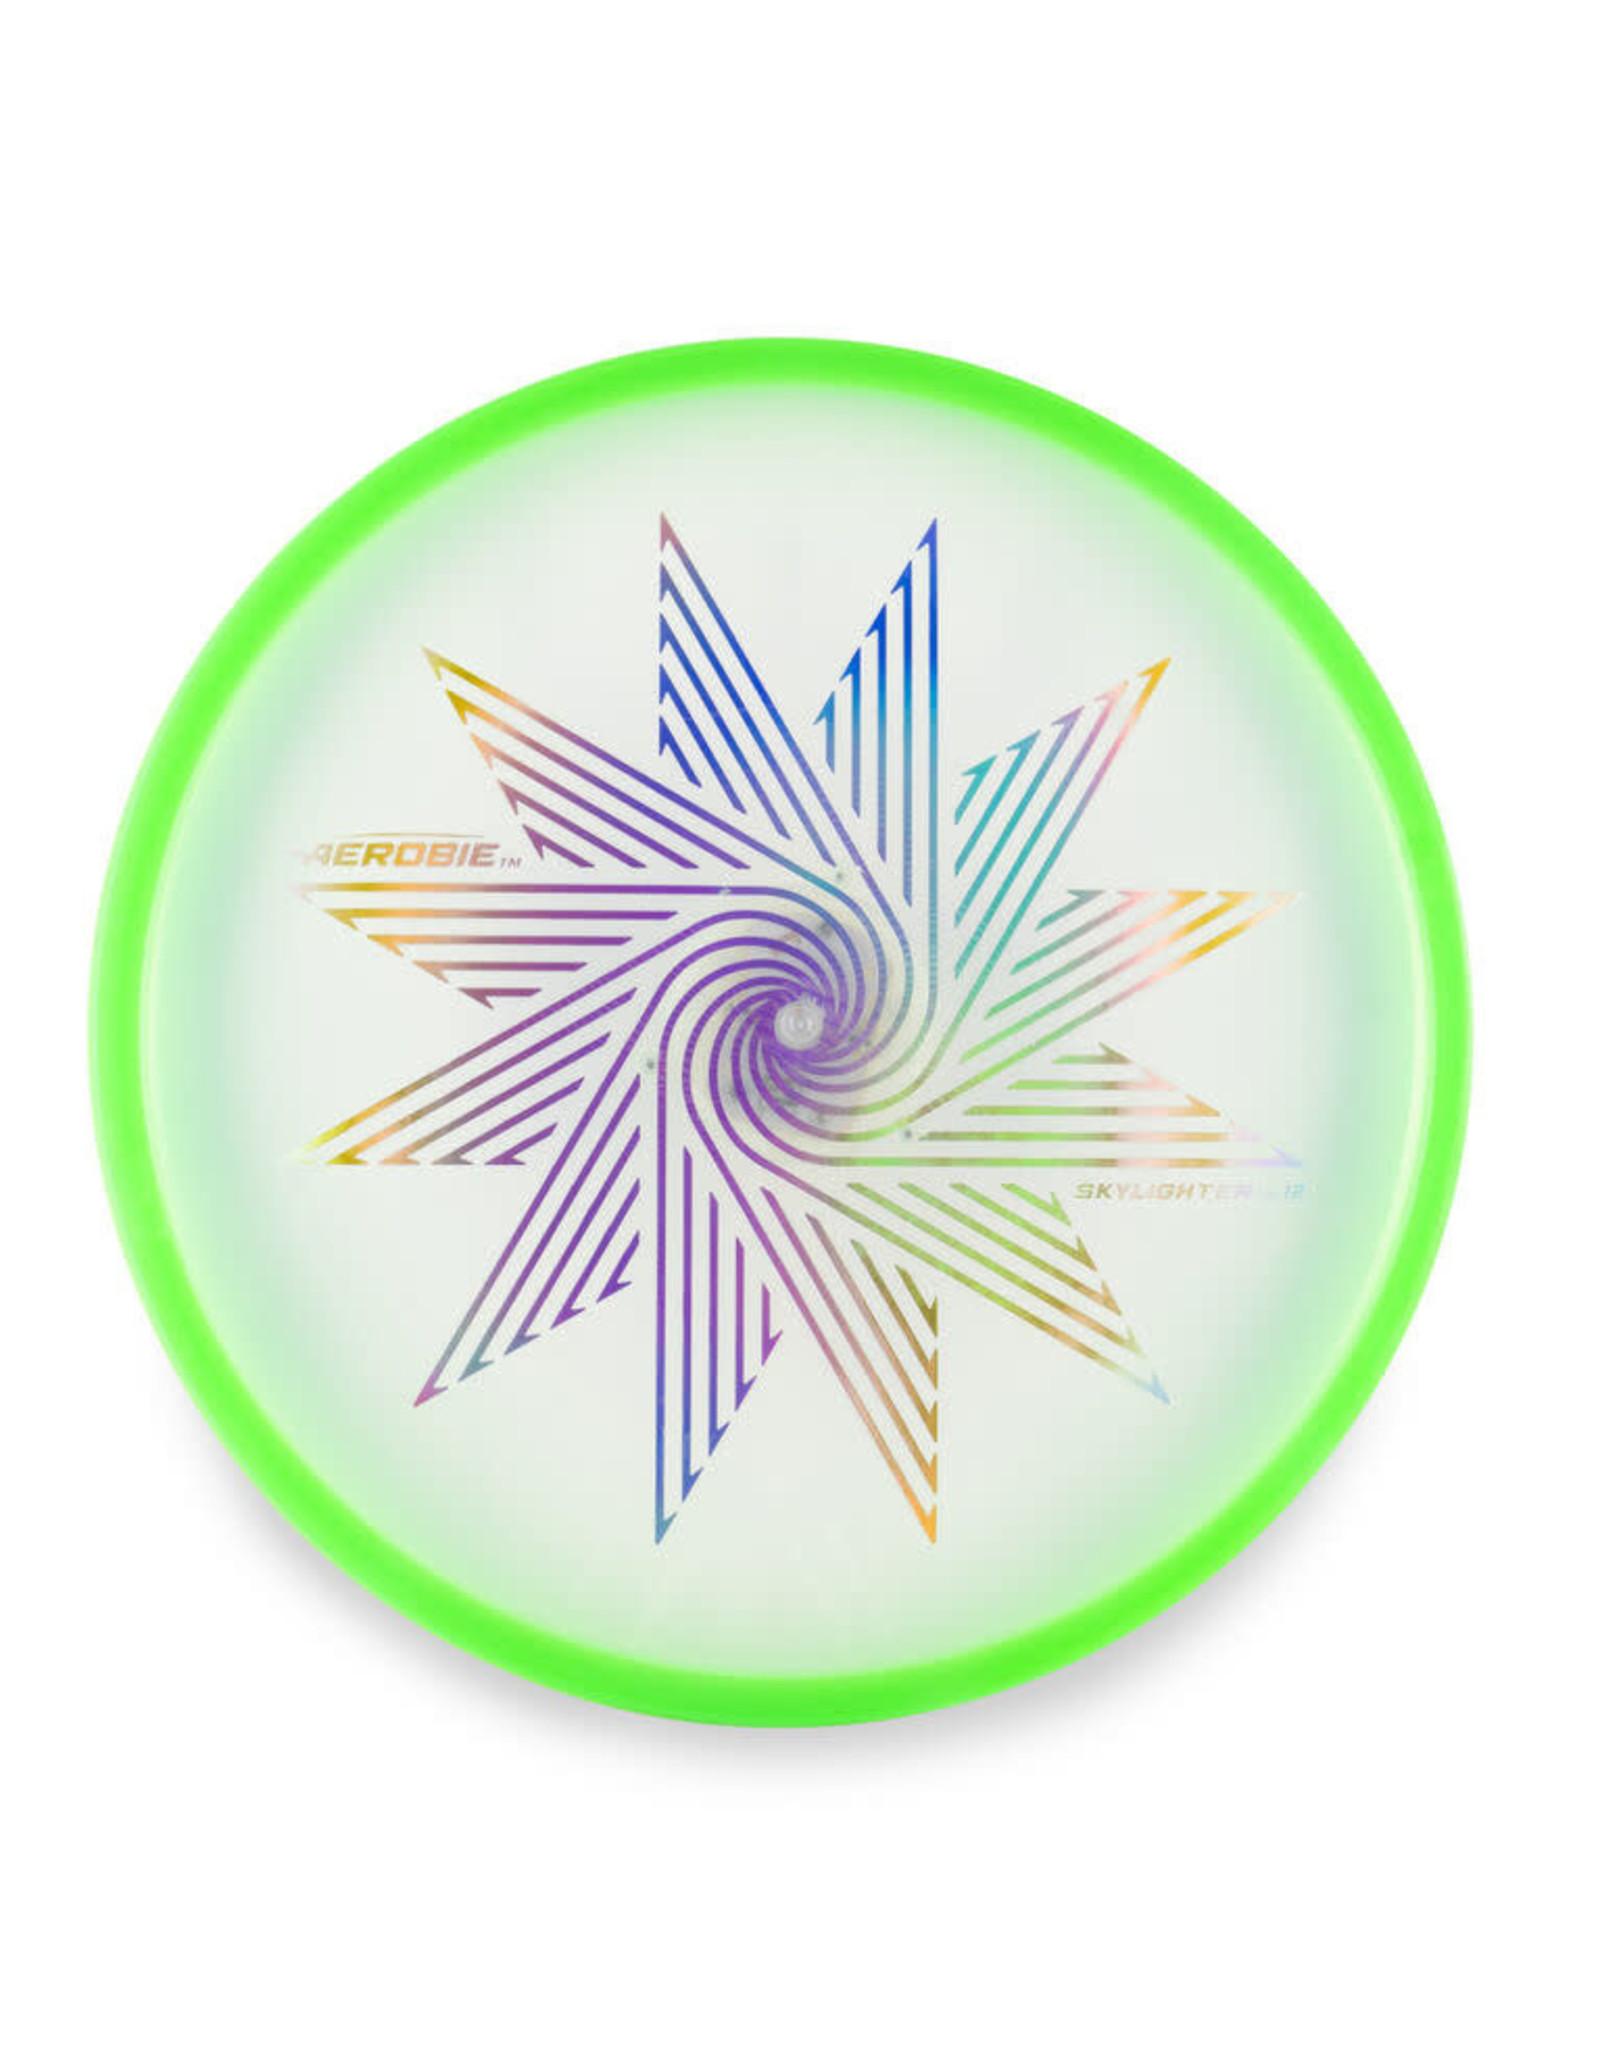 Aerobie Aerobie SkyLighter Light Up Flying Disk Green